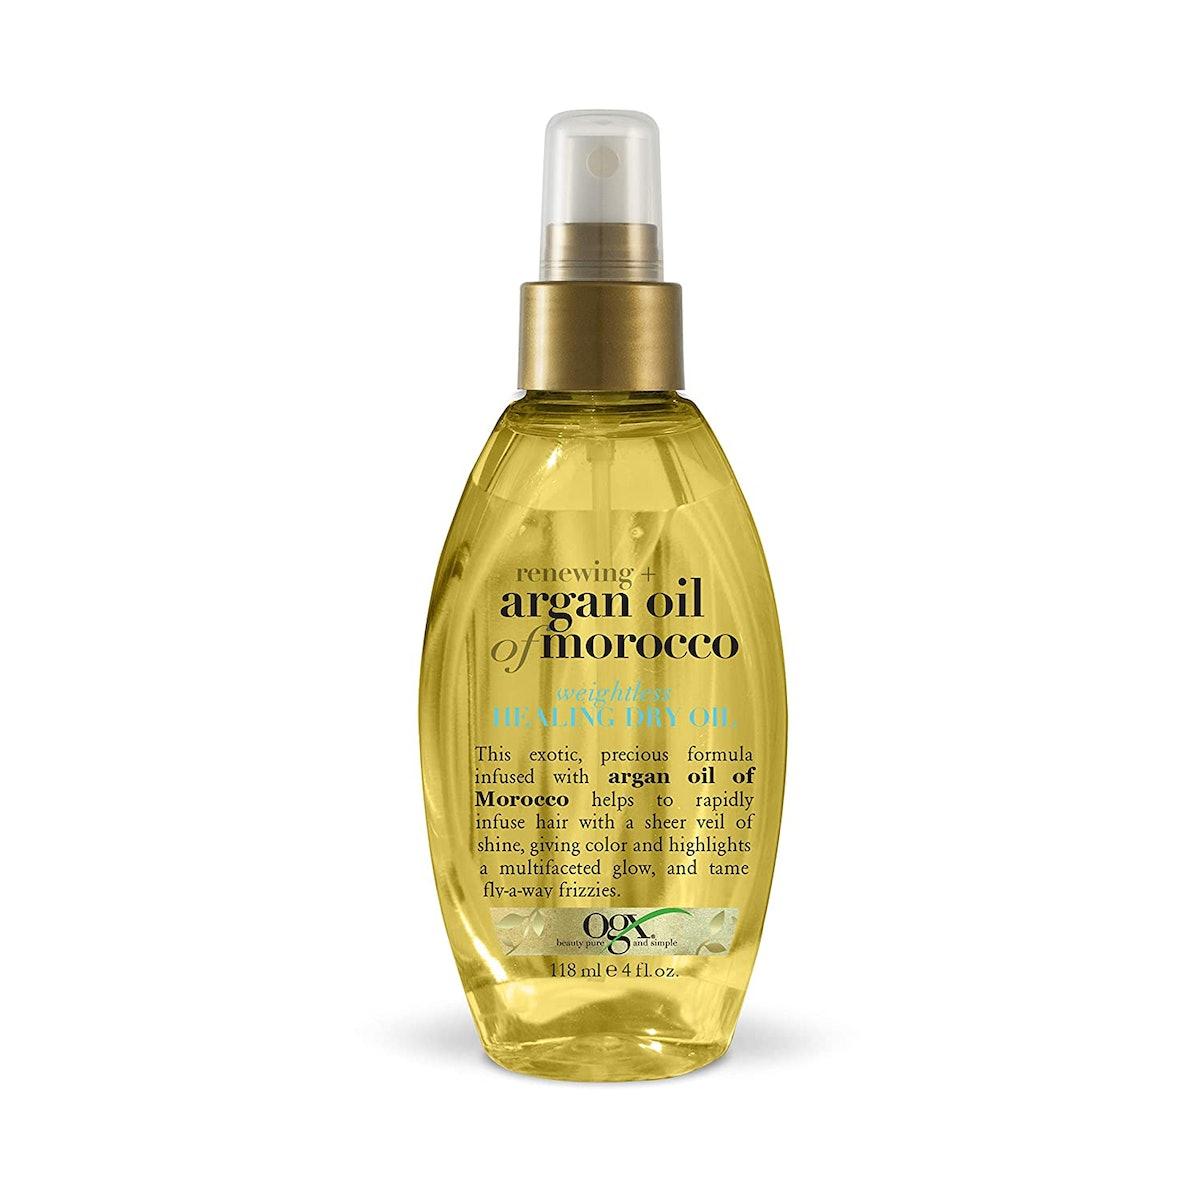 Renewing + Argan Oil of Morocco Weightless Healing Dry Oil Spray